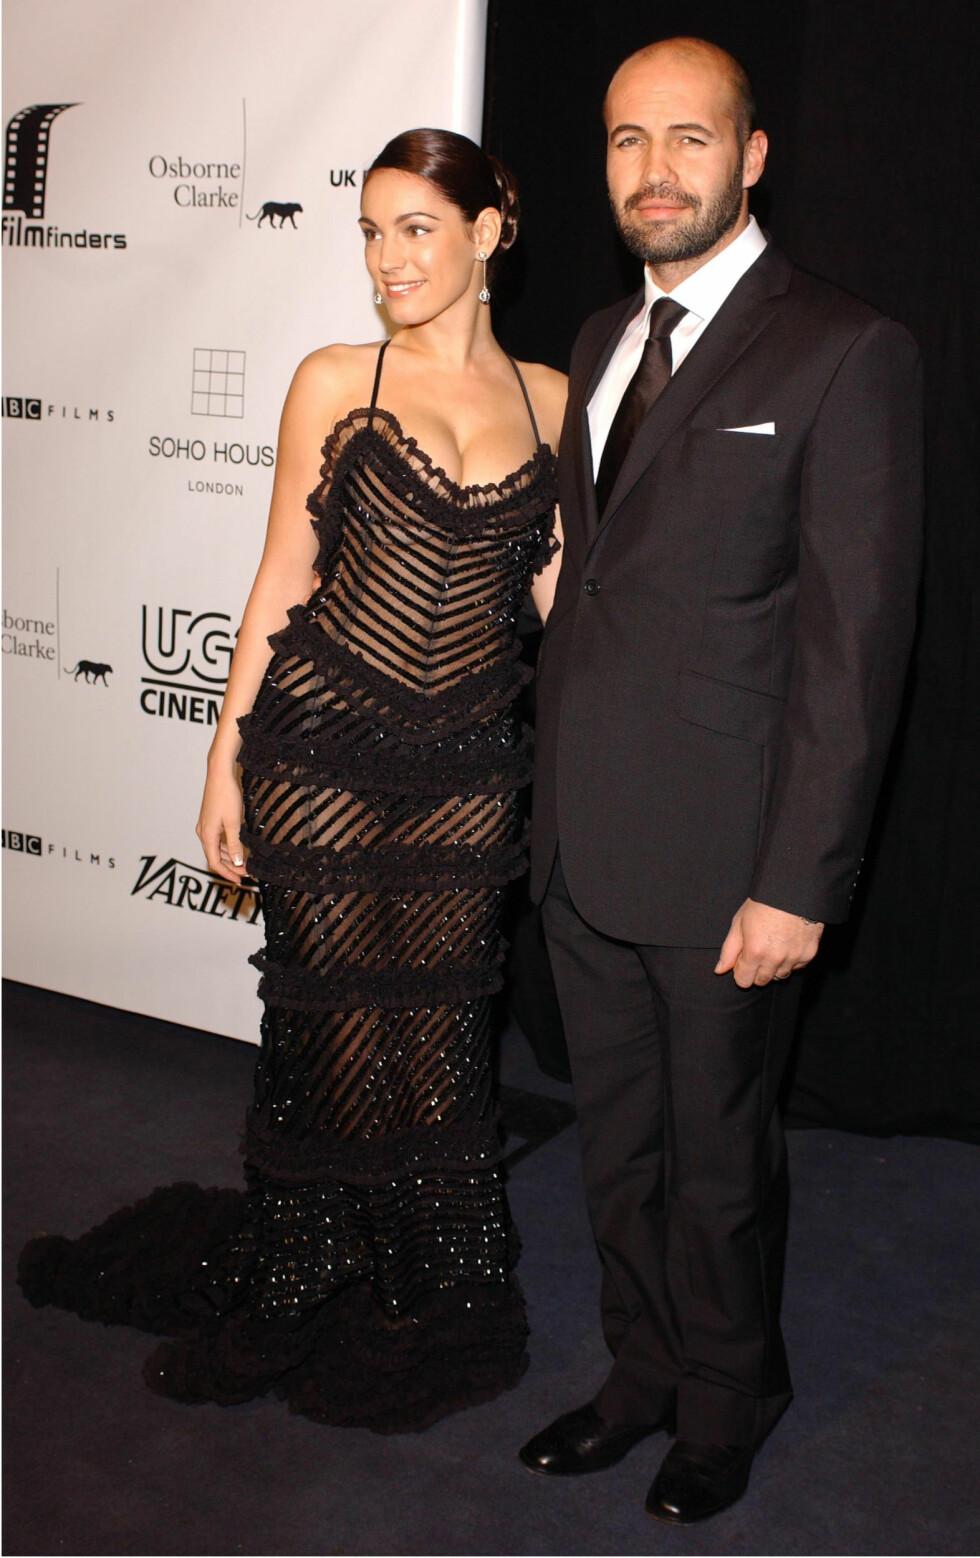 ANNO 2004: Skuespiller Kelly Brook og Billy Zane kastet glans over en filmpremiere i London i 2004 - og skjønnheten stilte i denne dristige kjolen. Foto: NTB Scanpix